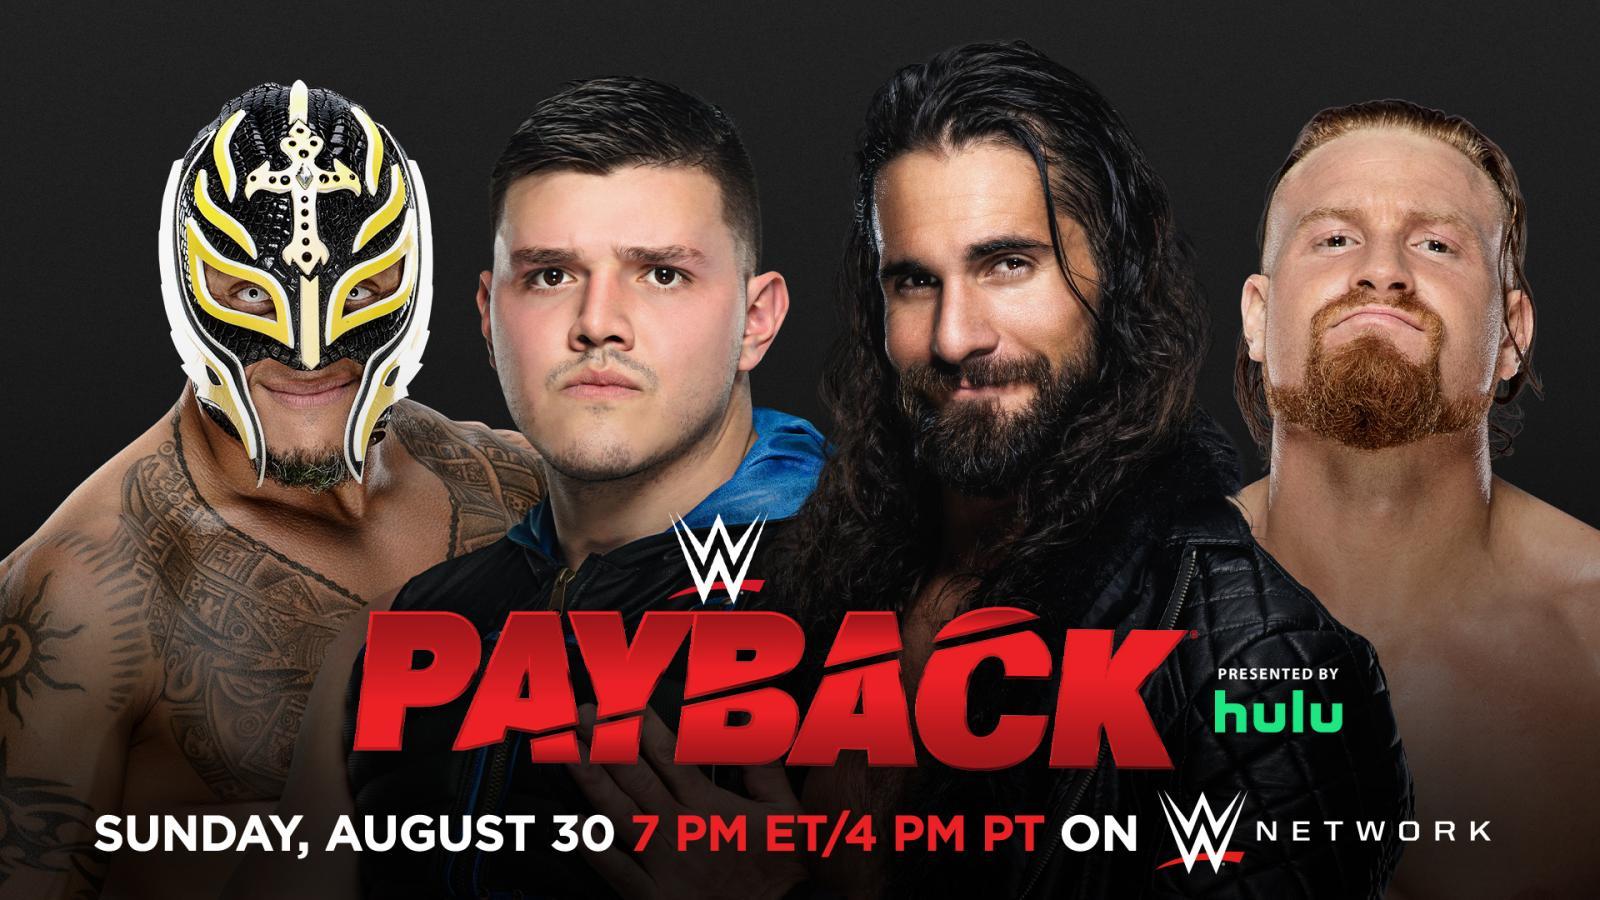 Rey Mysterio & Dominik Mysterio vs Seth Rollins & Murphy - WWE Payback 2020